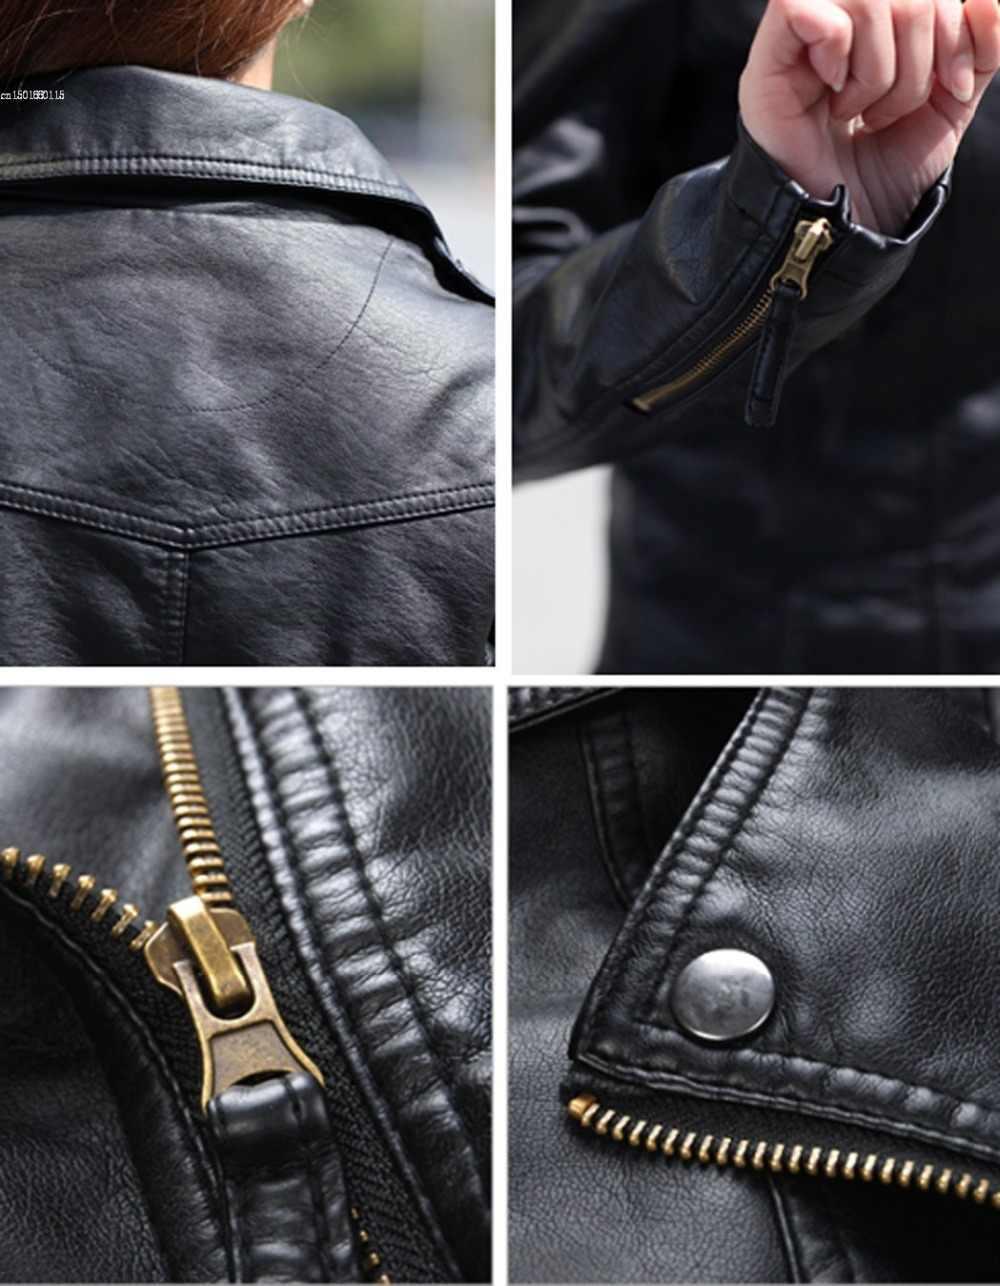 Women's Leather Blazers Jacket Coat 2018 New Fashion Autumn Winter blaze Jackets Black Zippers Coat Motorcycle Outerwear Black